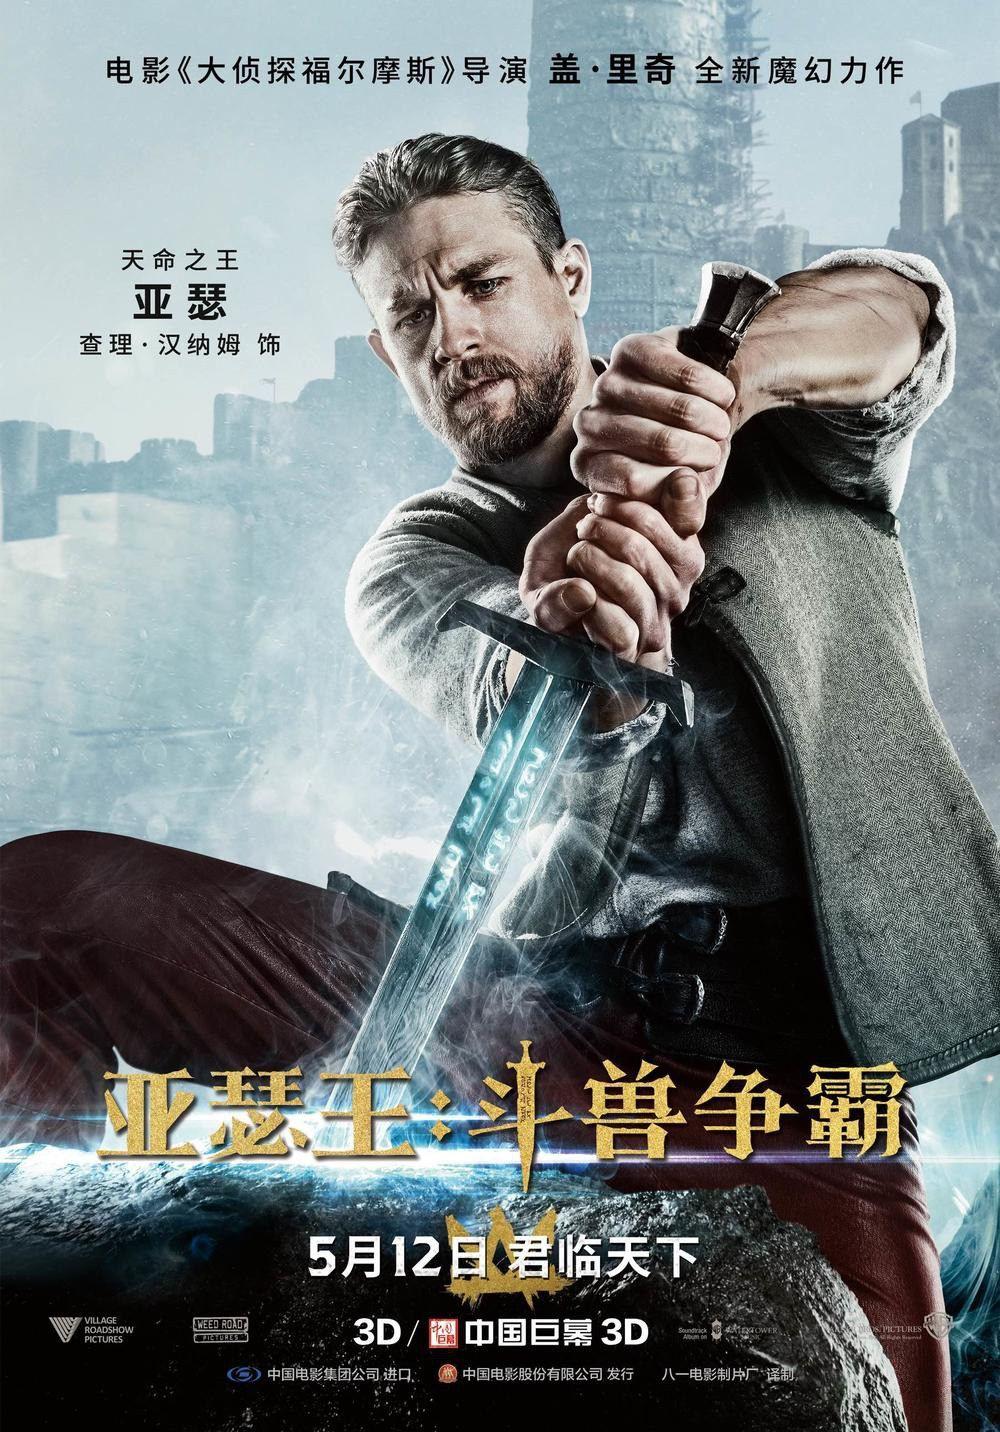 Poster Hd 1080p 1080p Filmes